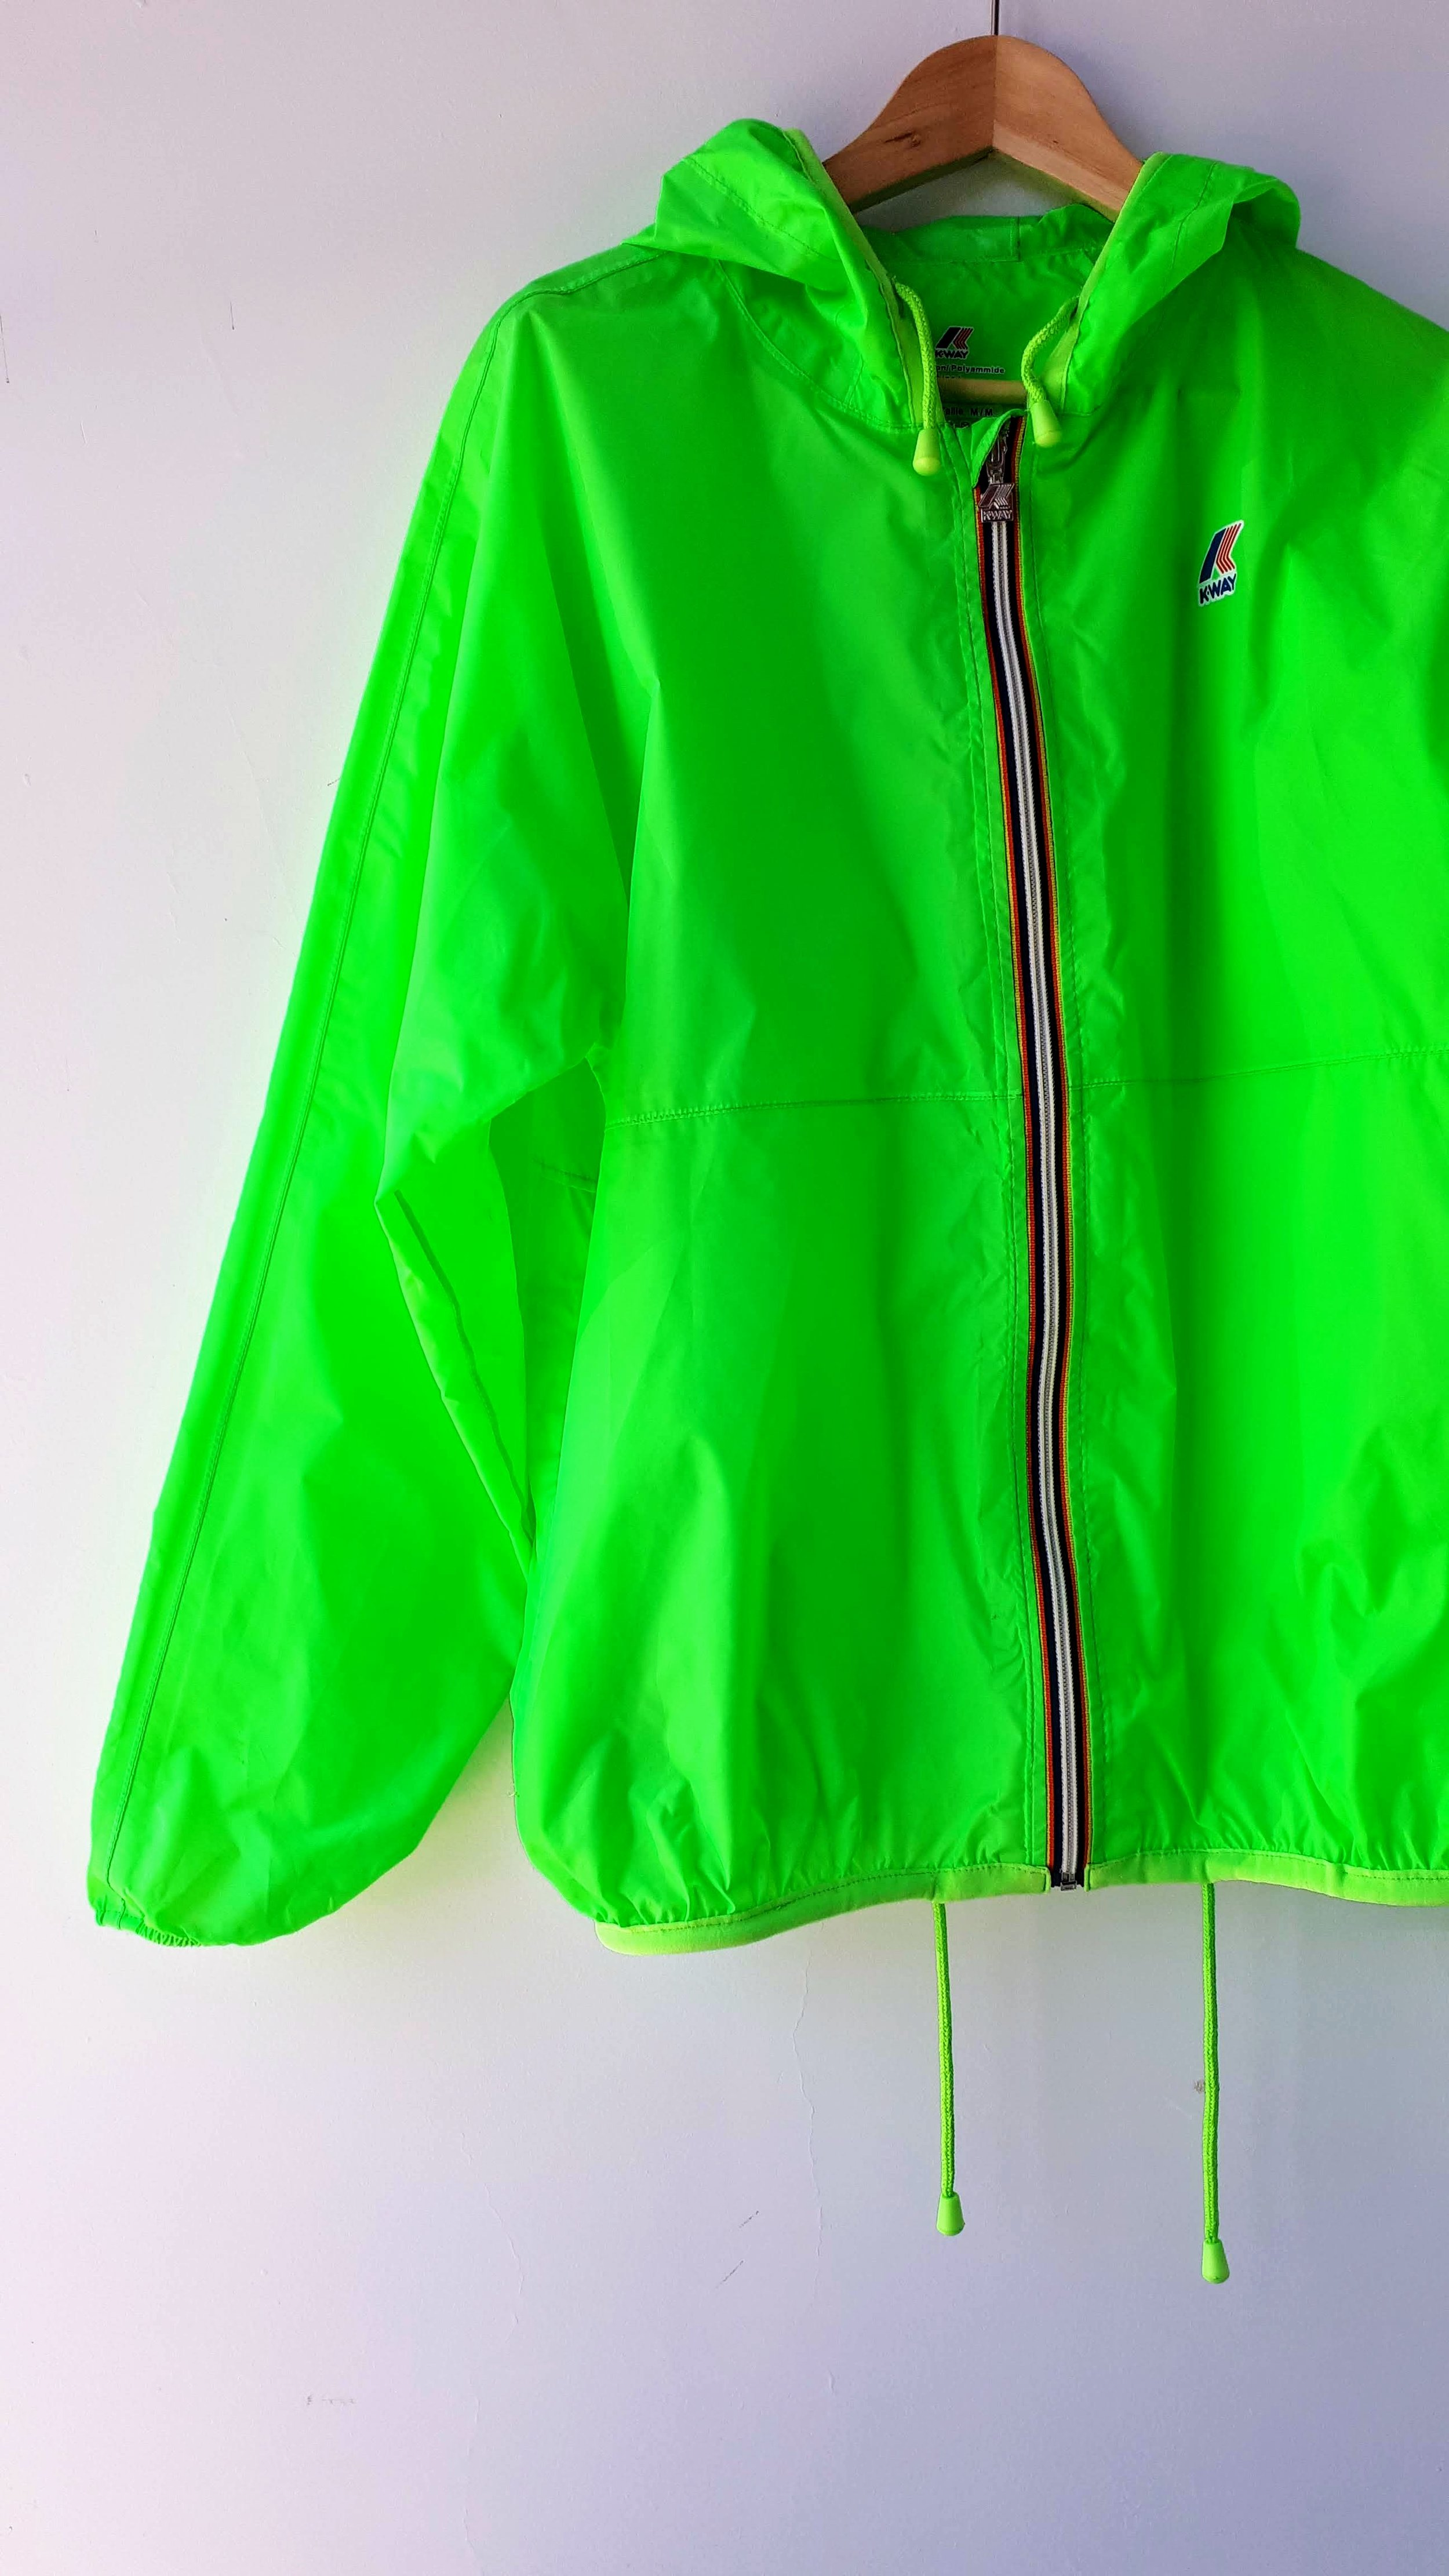 K-Way jacket; Men's size M, $48